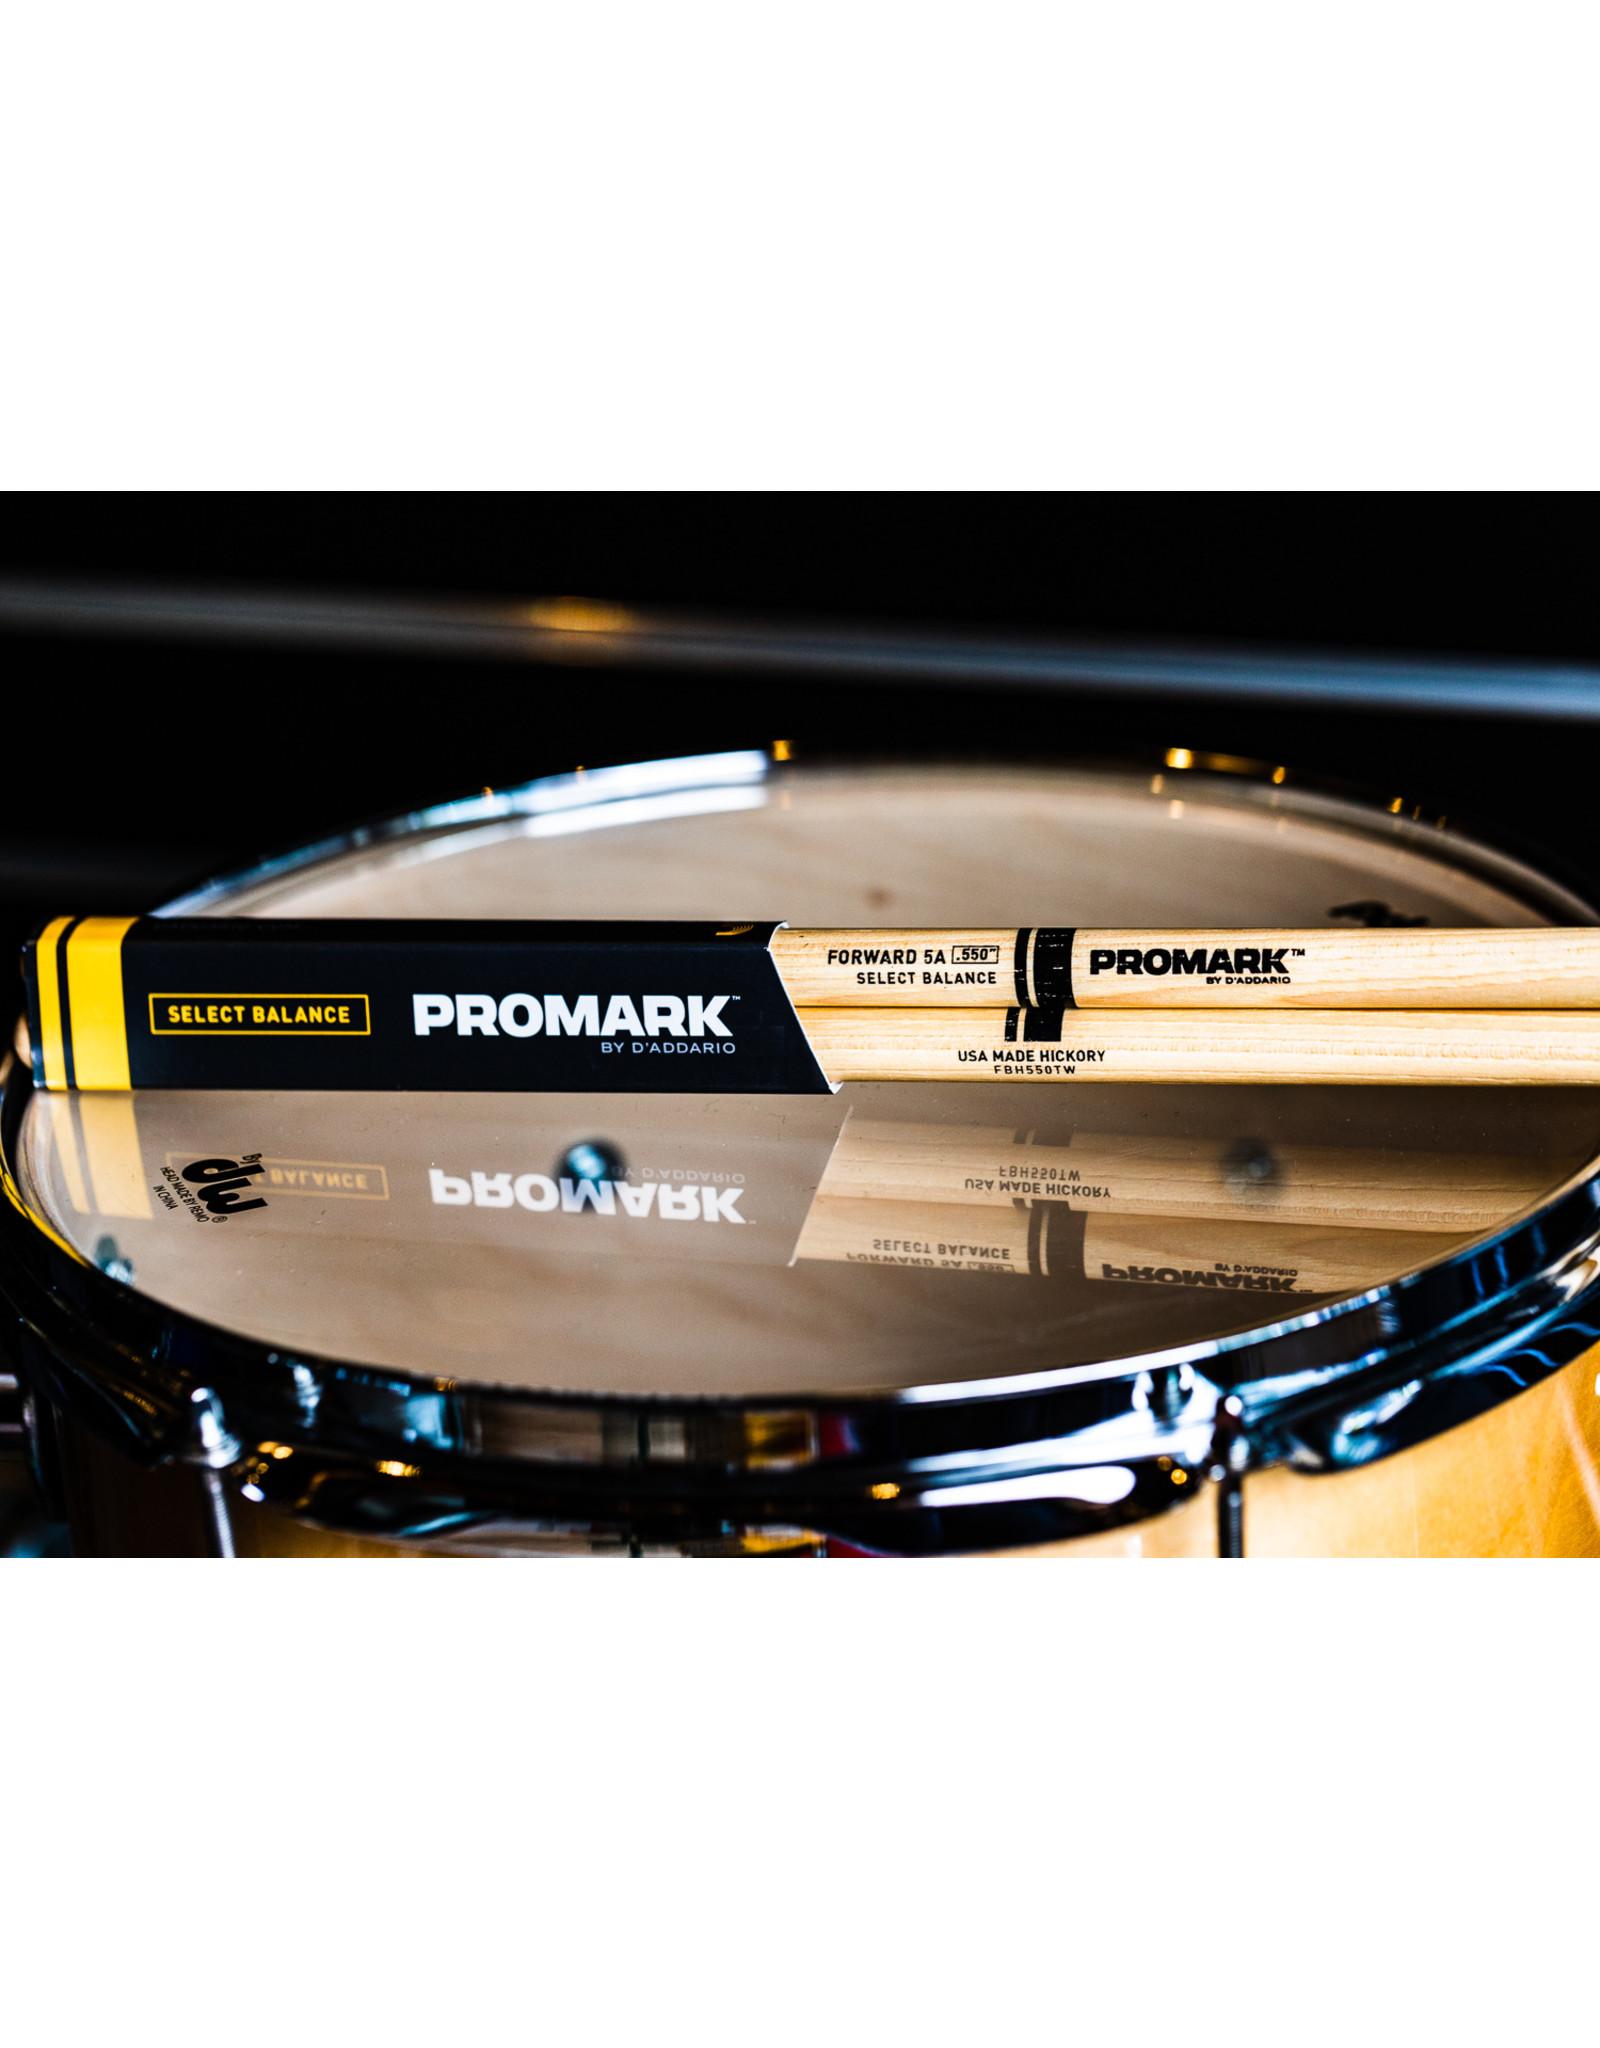 "Promark Promark Forward Balance .550"" TD Wood Drum Sticks"